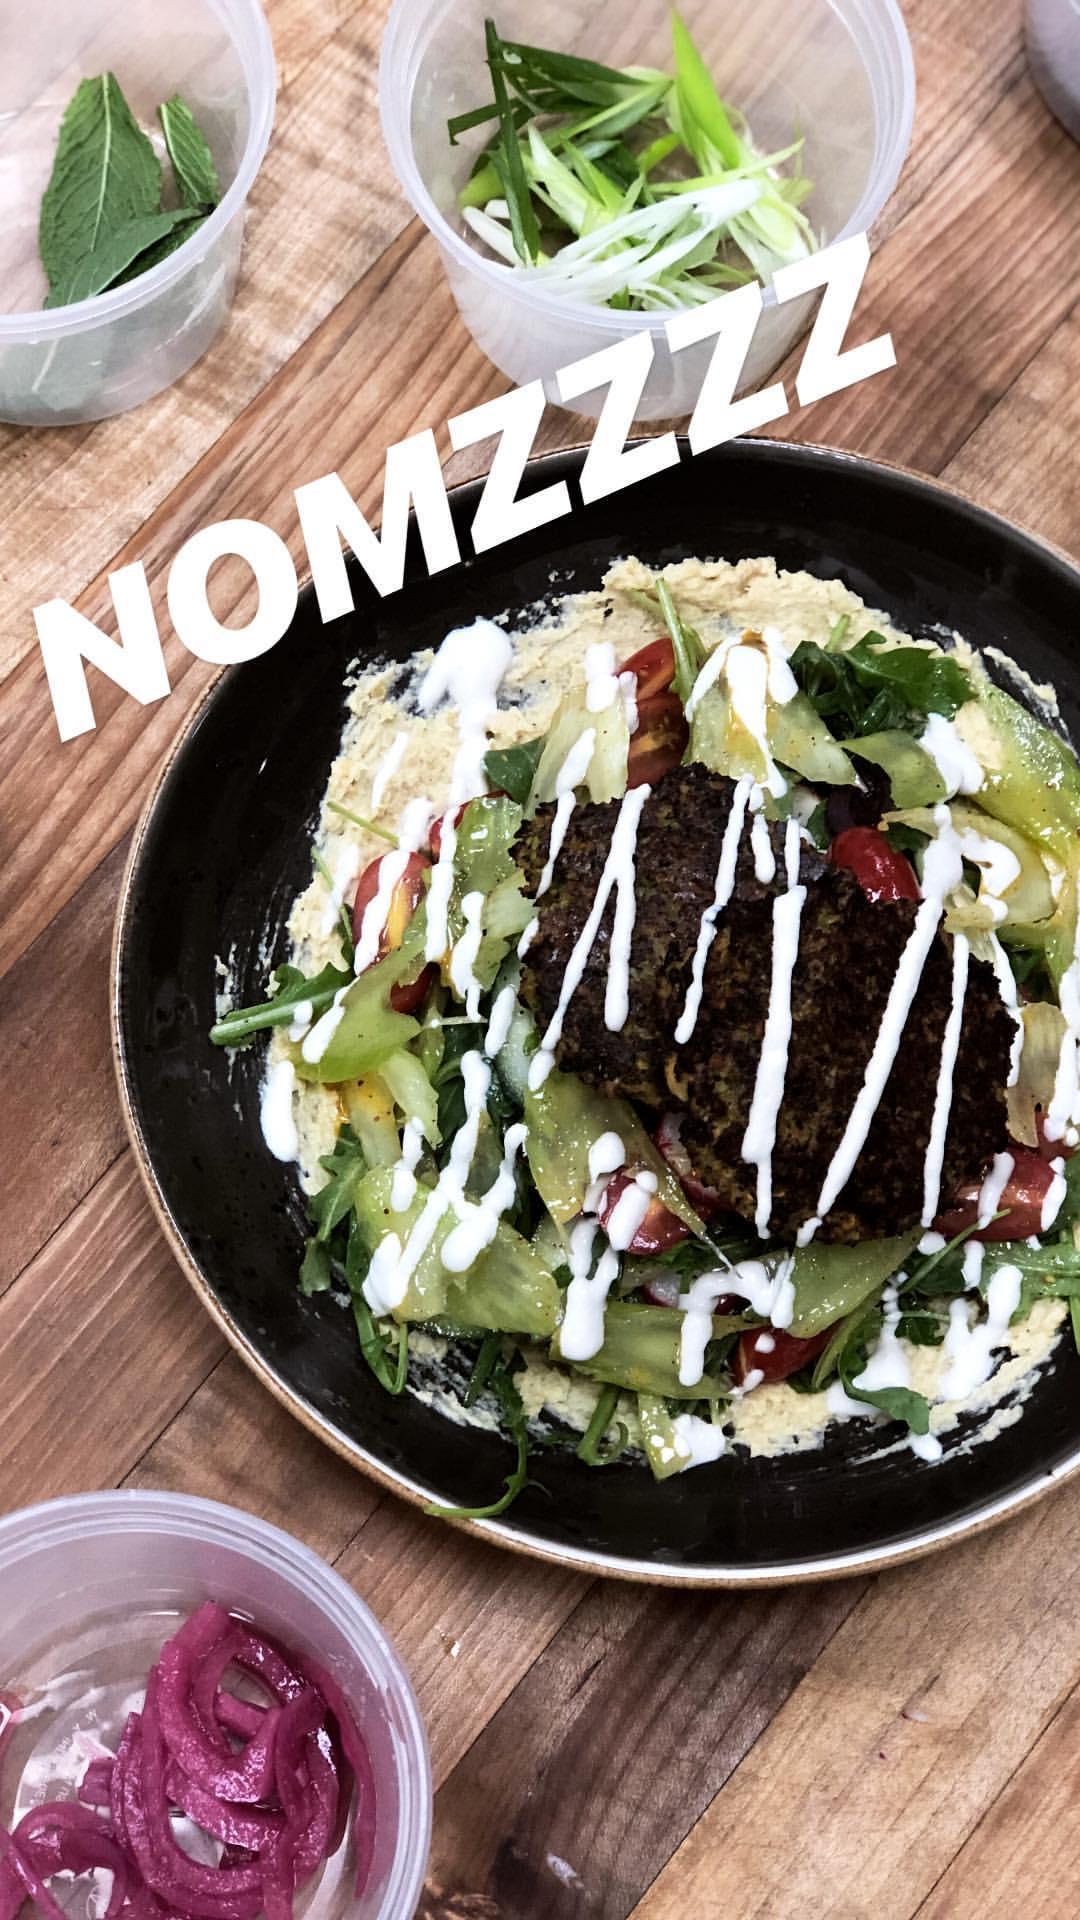 2018.11.27_eatrunandallinbetween, Instagram Story_Mix It Up_Chapter 2_Life Alive Brookline11.jpg